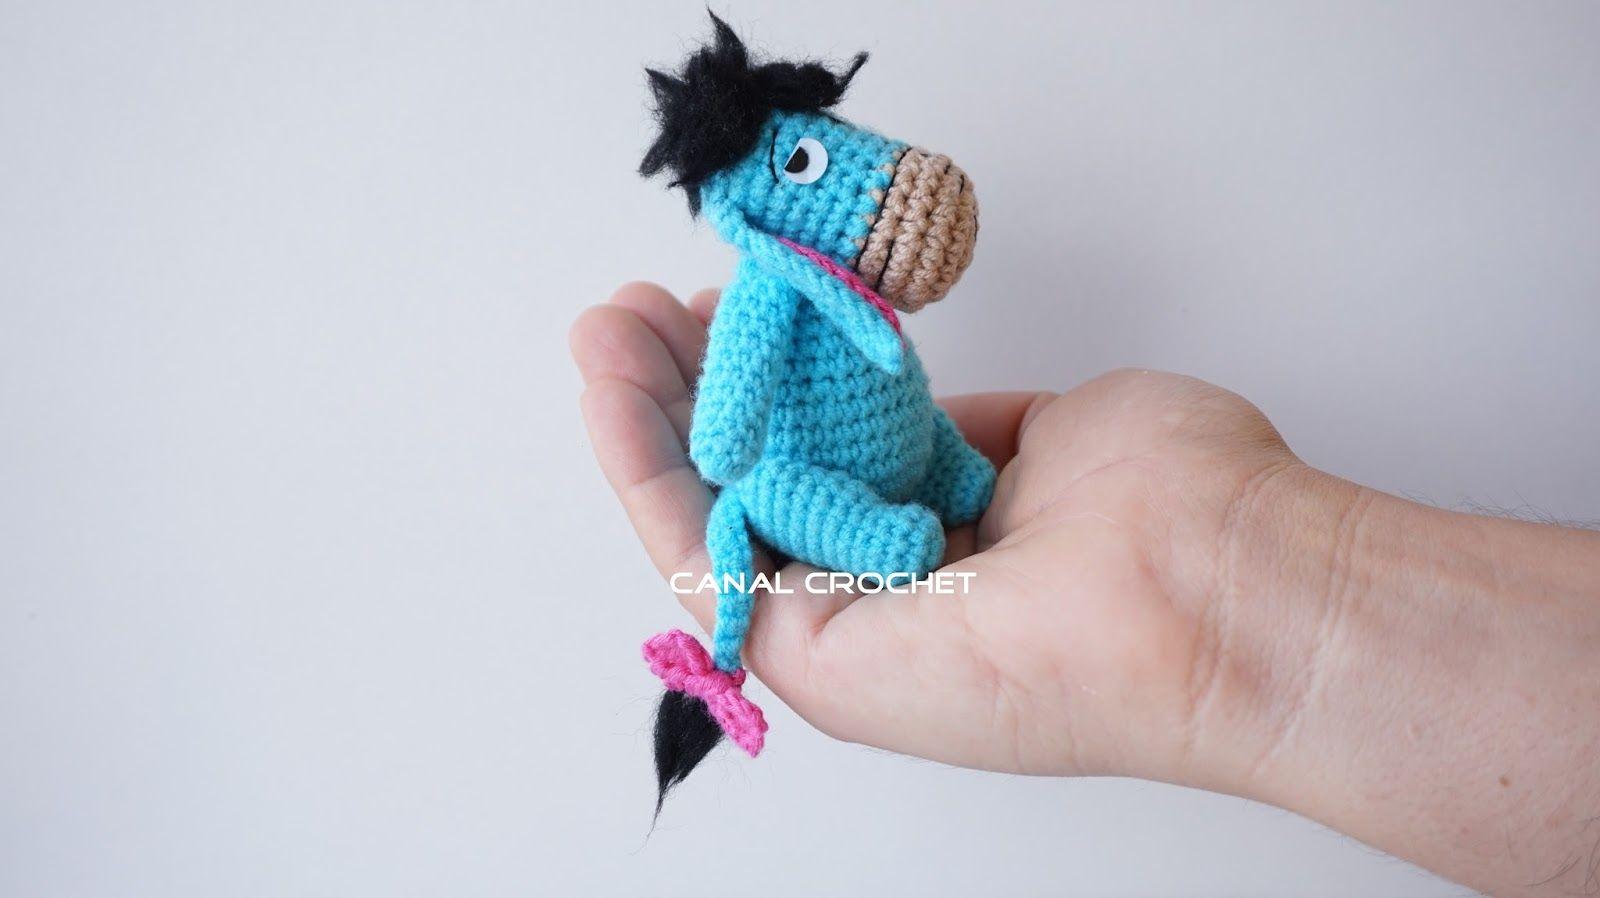 Tutorial Amigurumi : Crochet shell stitch tutorial patterns